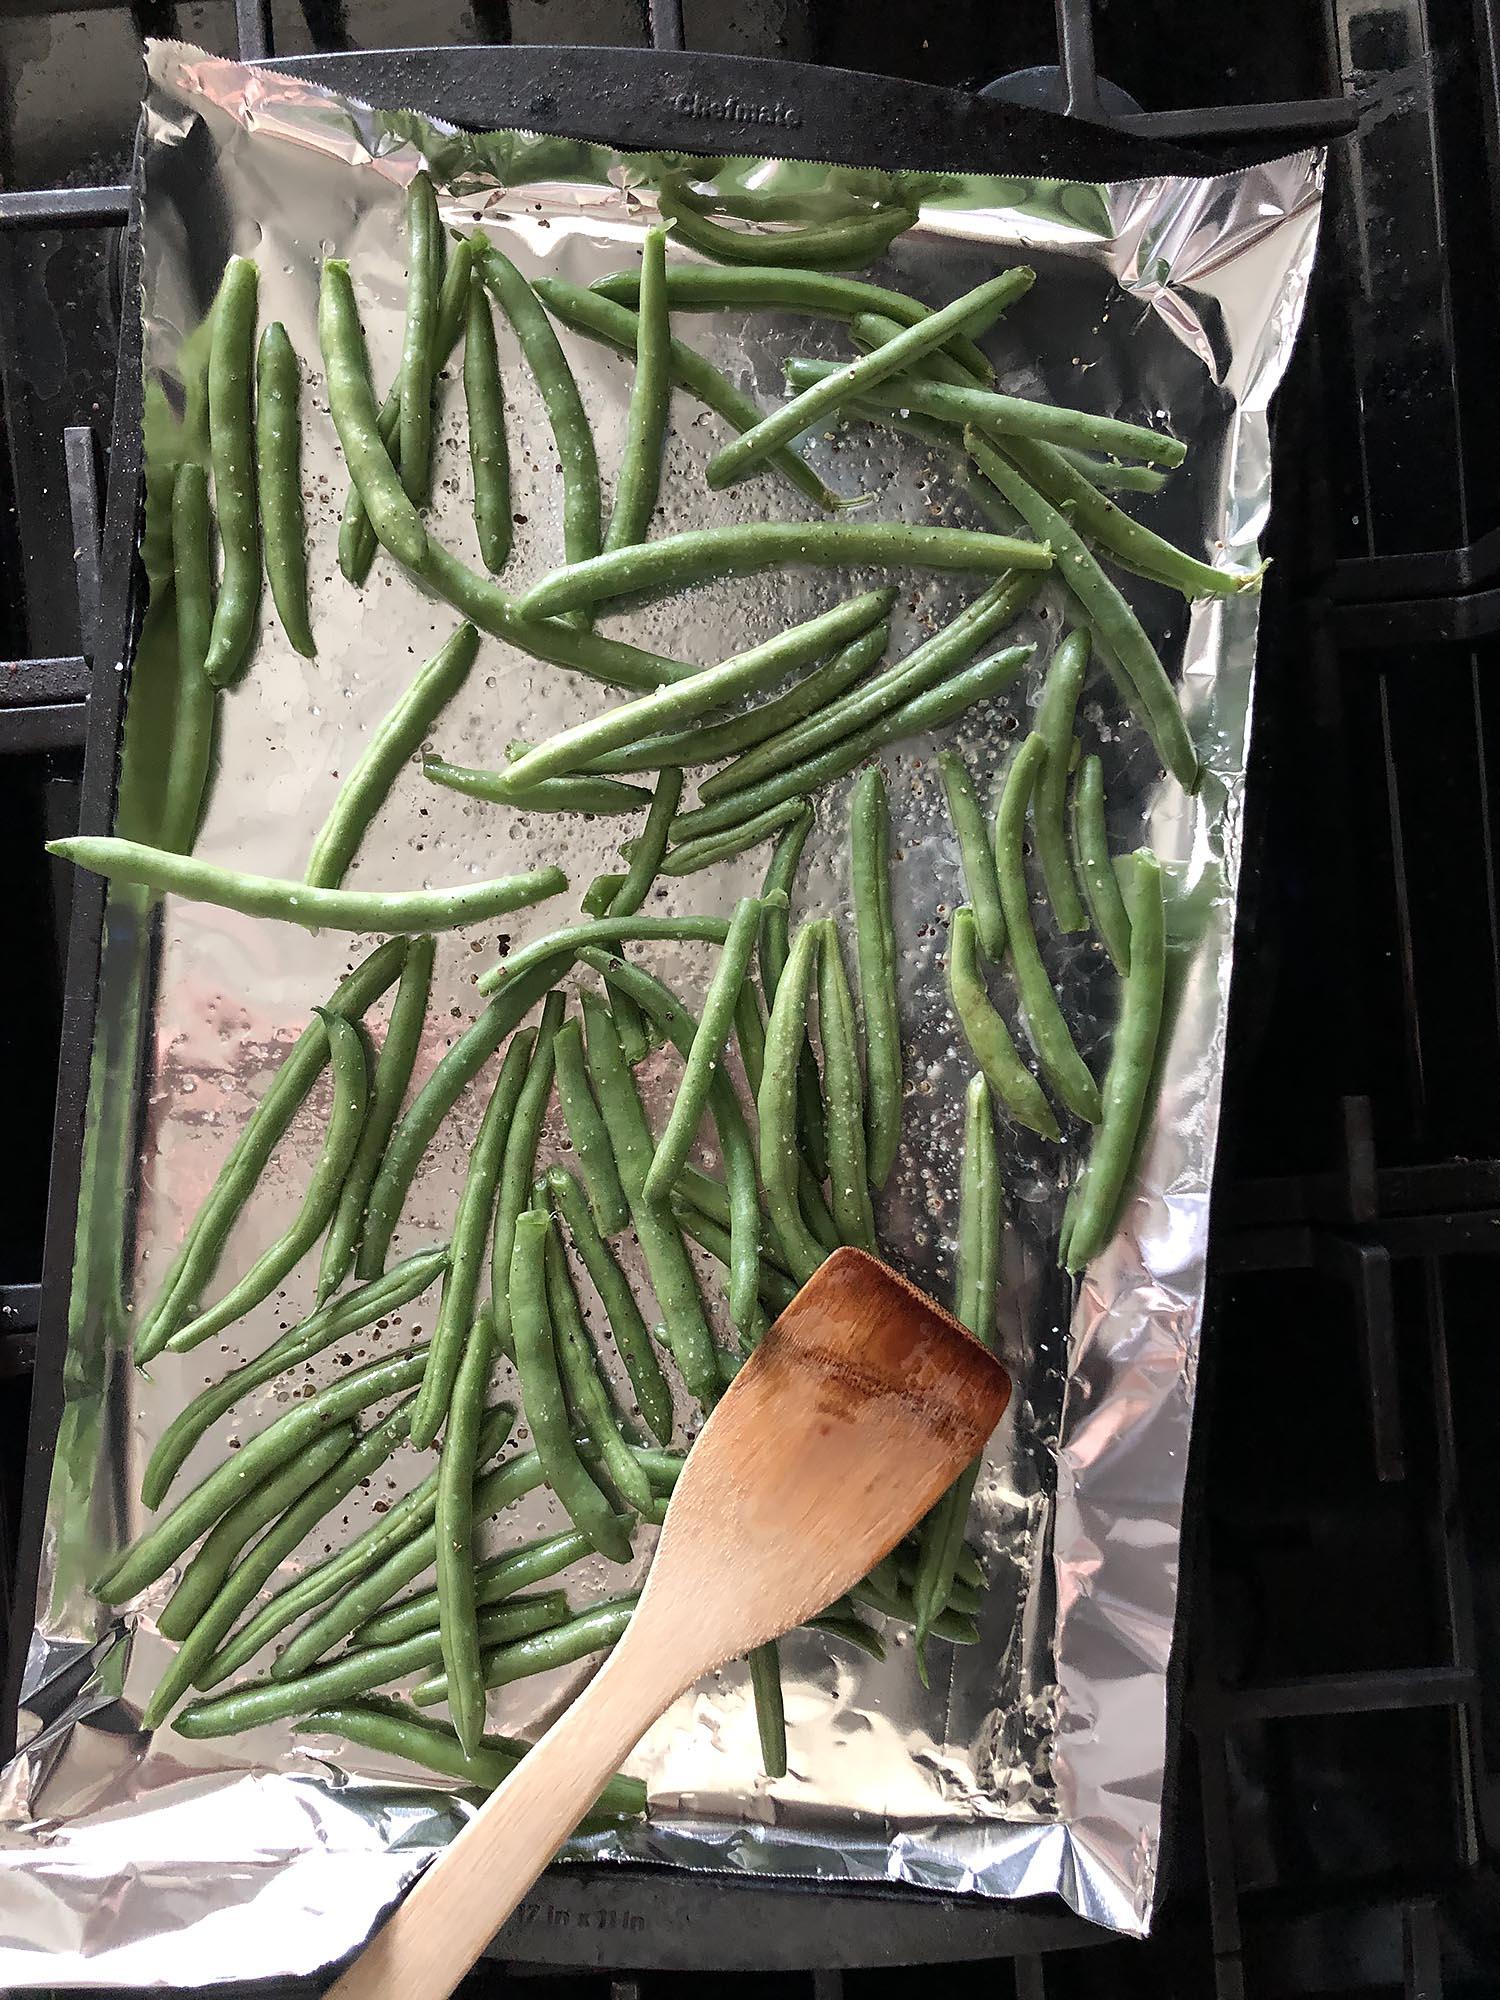 seasoned green beans on a baking sheet